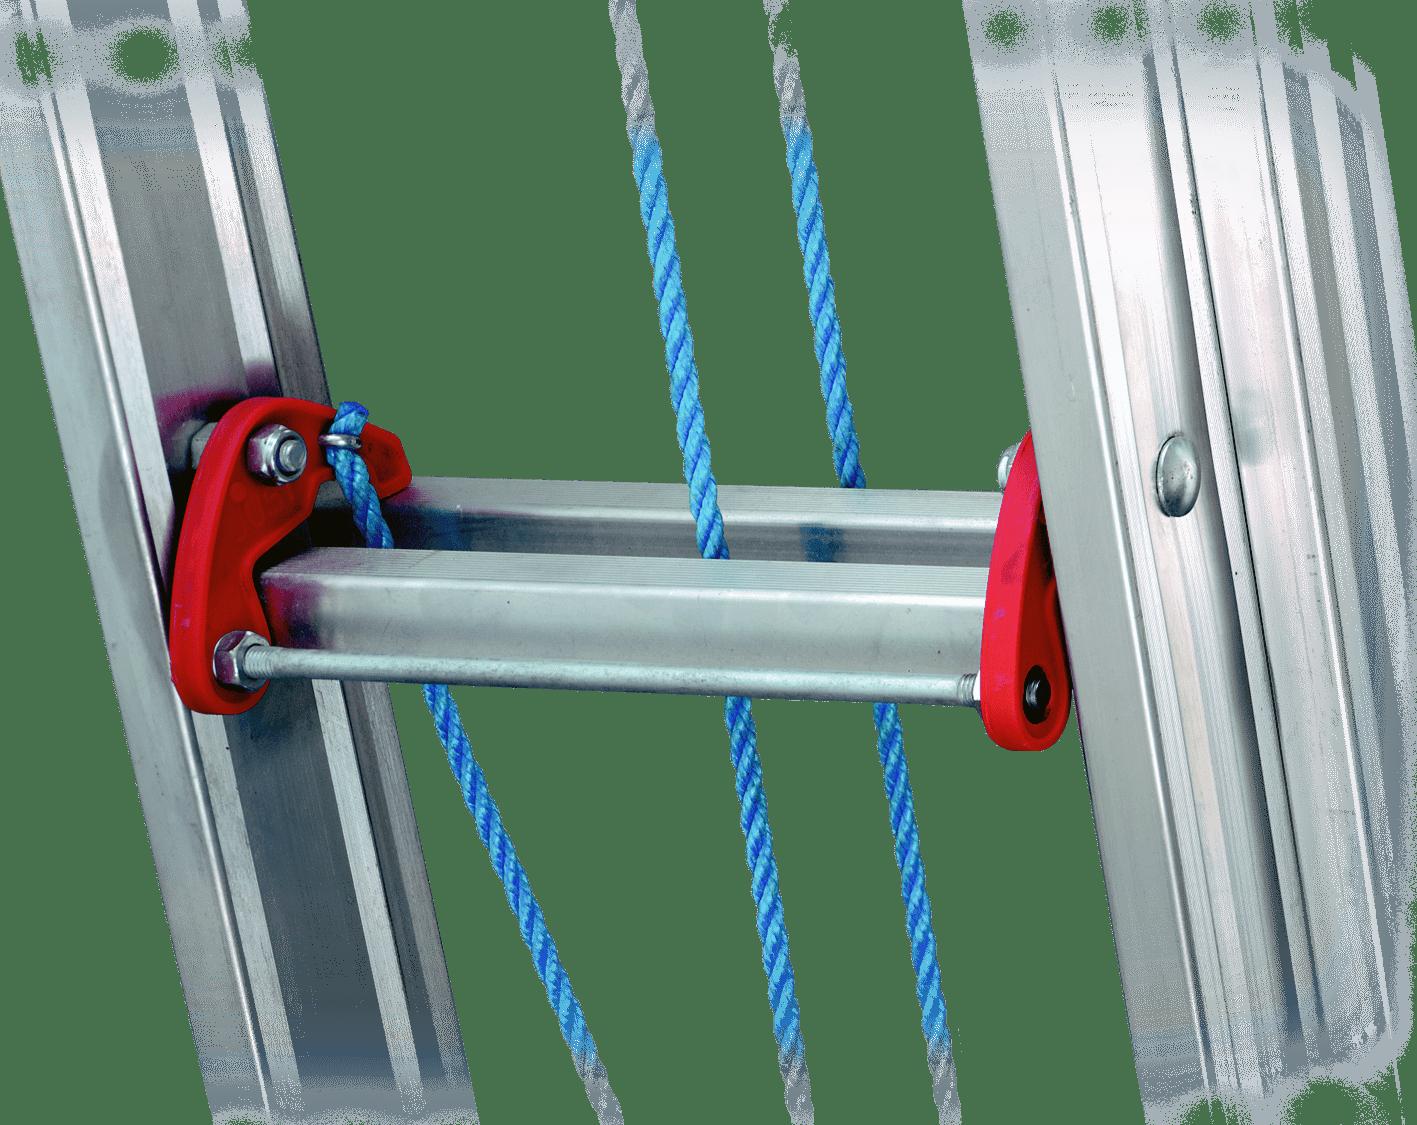 poloautomat pre lanoťahové rebríky